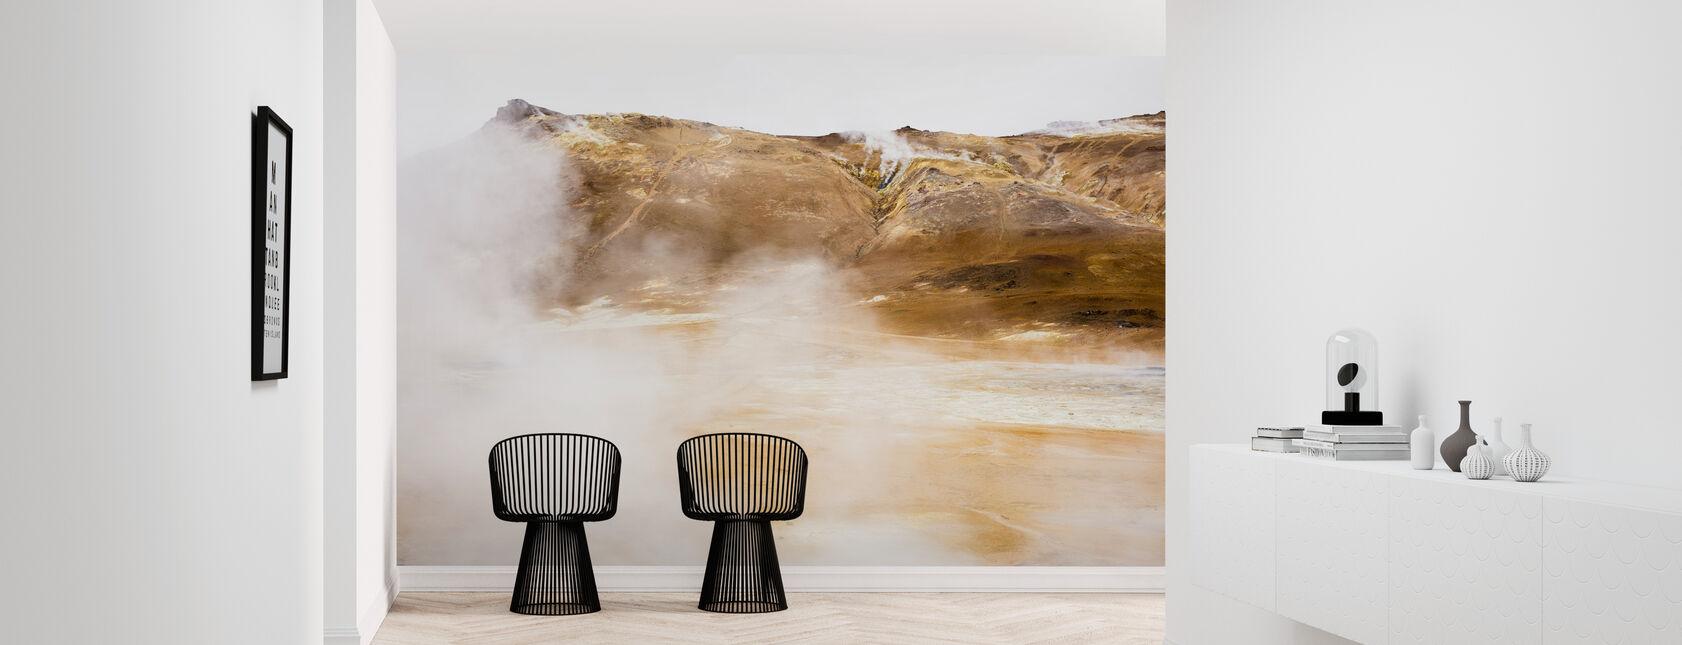 Hot Springs of Námafjall - Tapetti - Aula